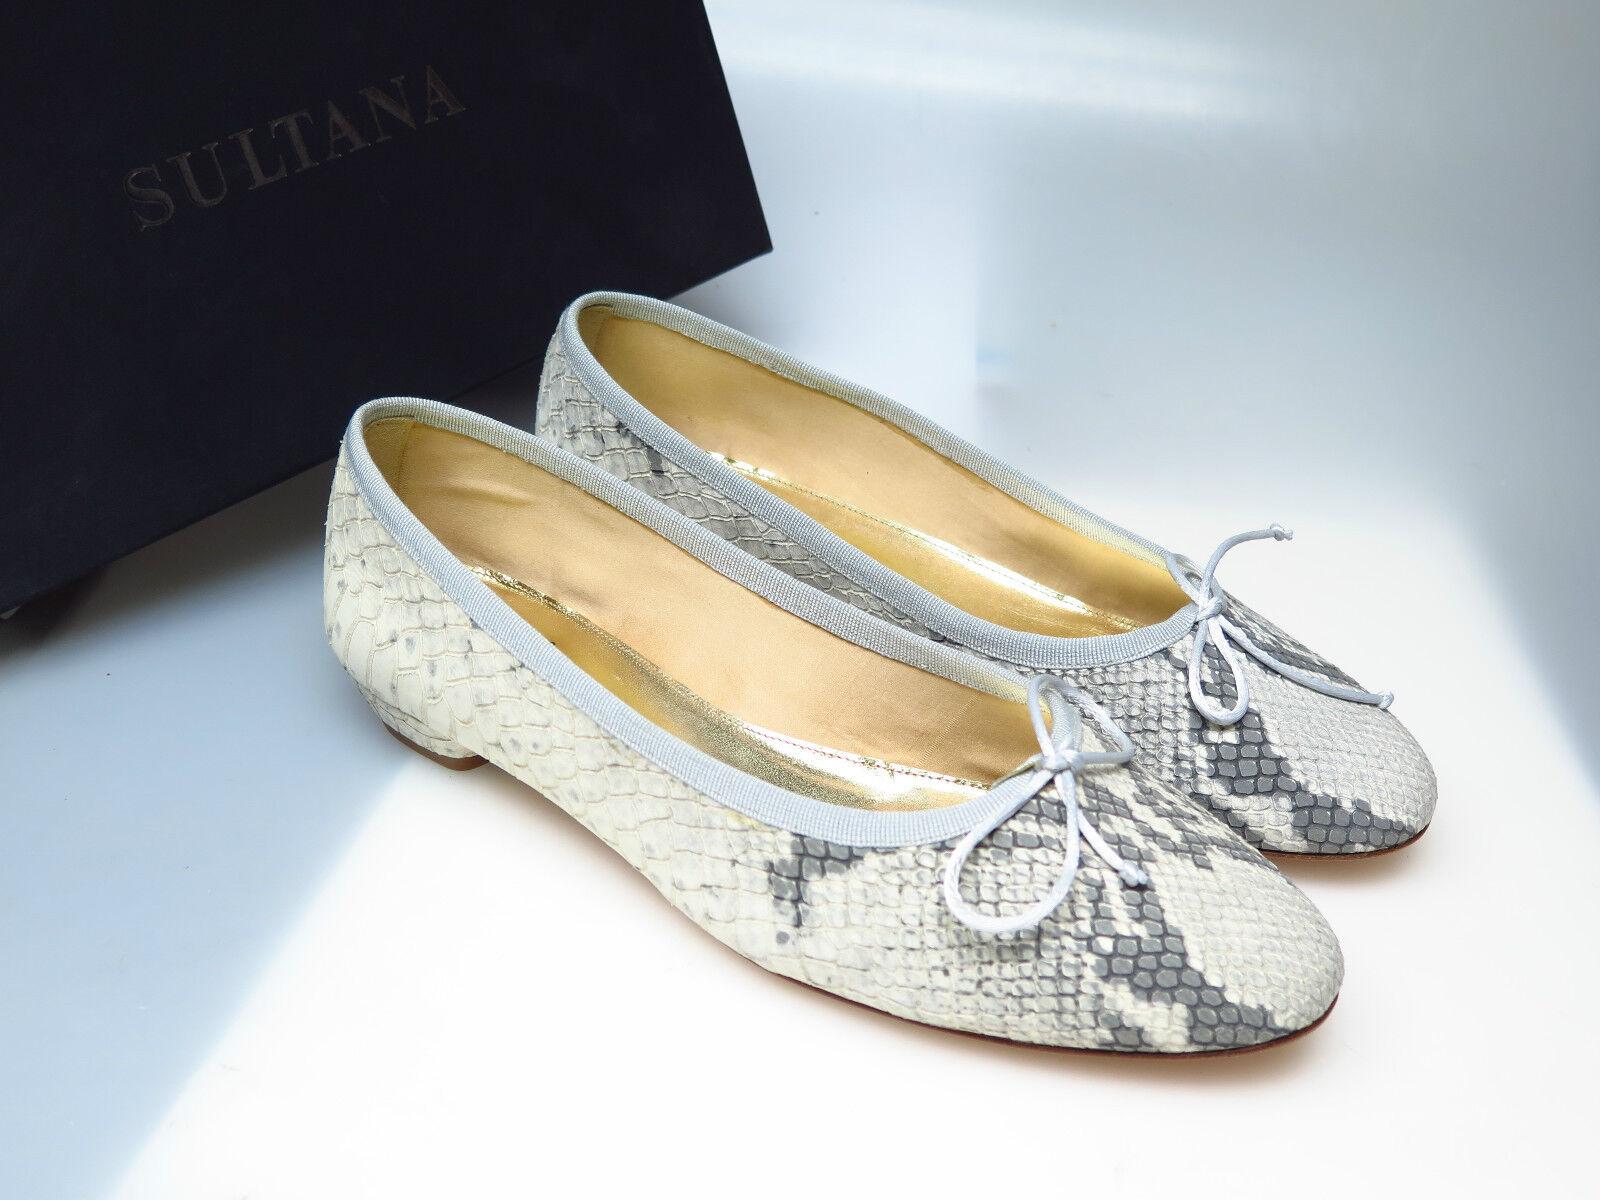 SULTANA Schuhe Designer Designer Designer Damenschuhe N3821 TER Boa Roccia Orga Gr. 41,5 NEU 9737ae